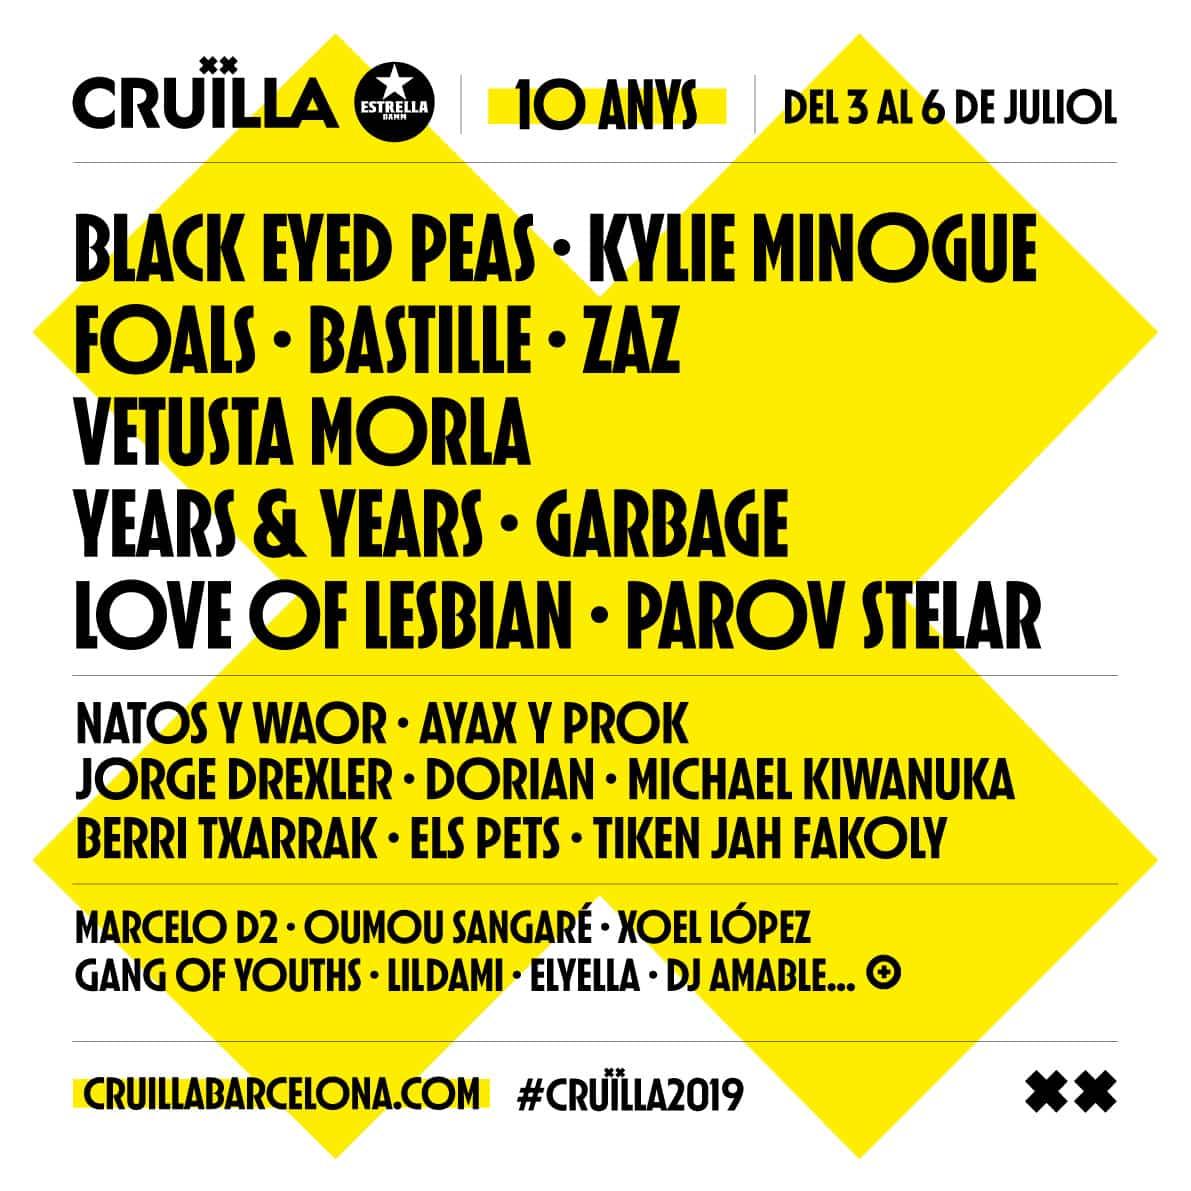 Cartell Cruïlla 2019